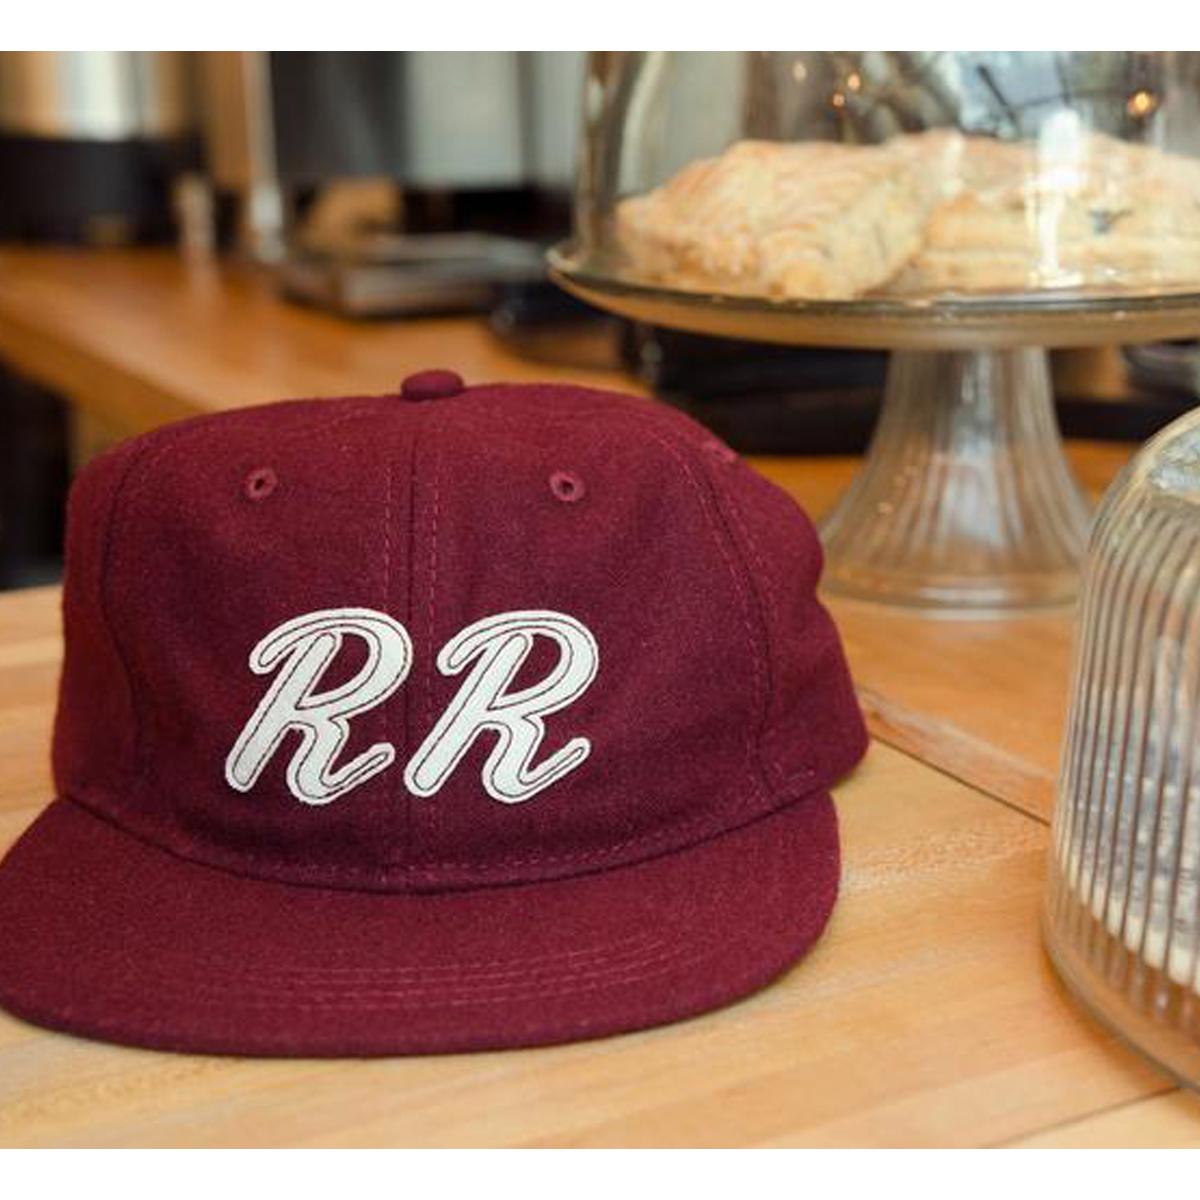 Twin Peaks RR Diner Felt Cap